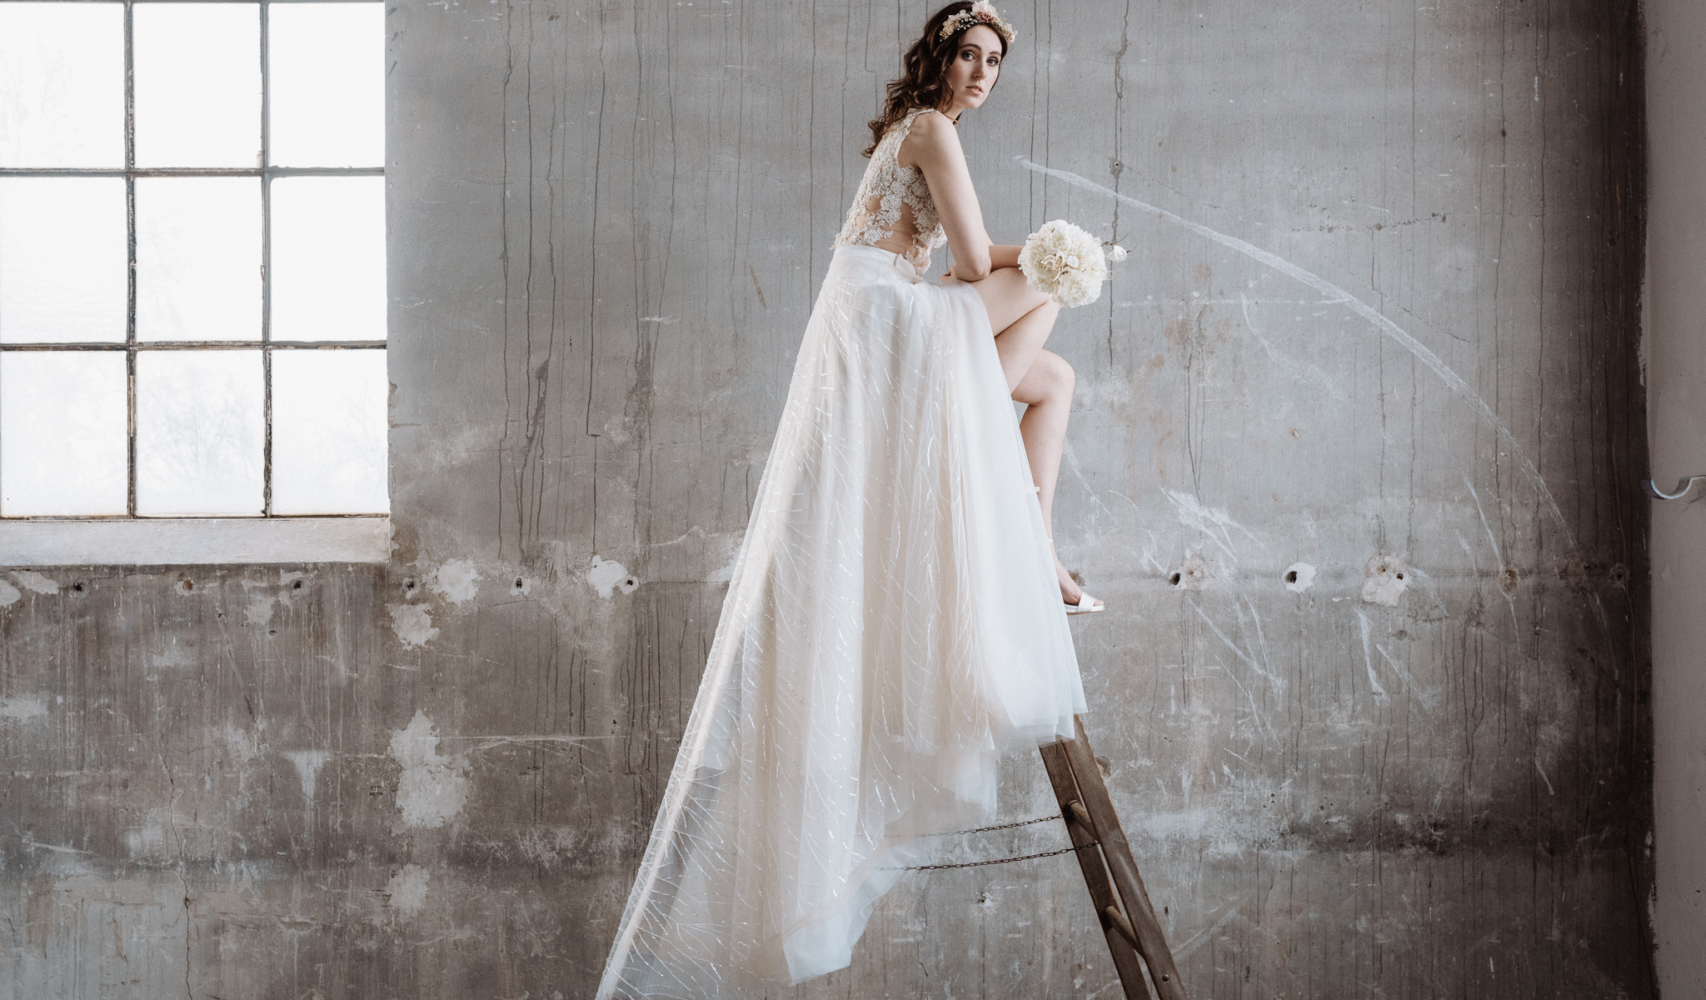 Bridal Editorial_ThuTrinh Photography 4